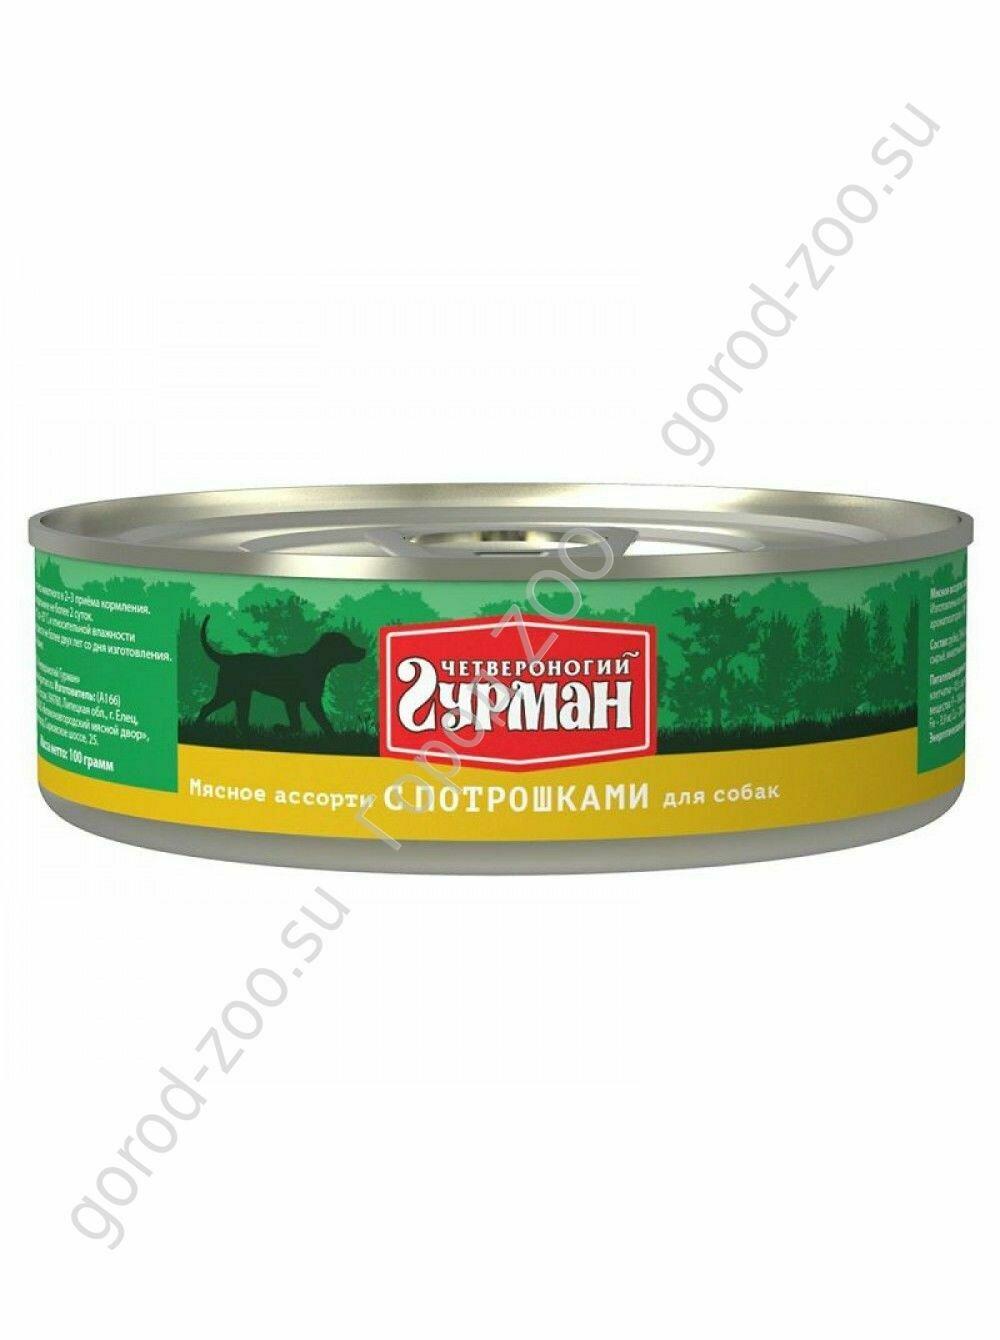 Четвероногий Гурман 100г д/собак потрошка